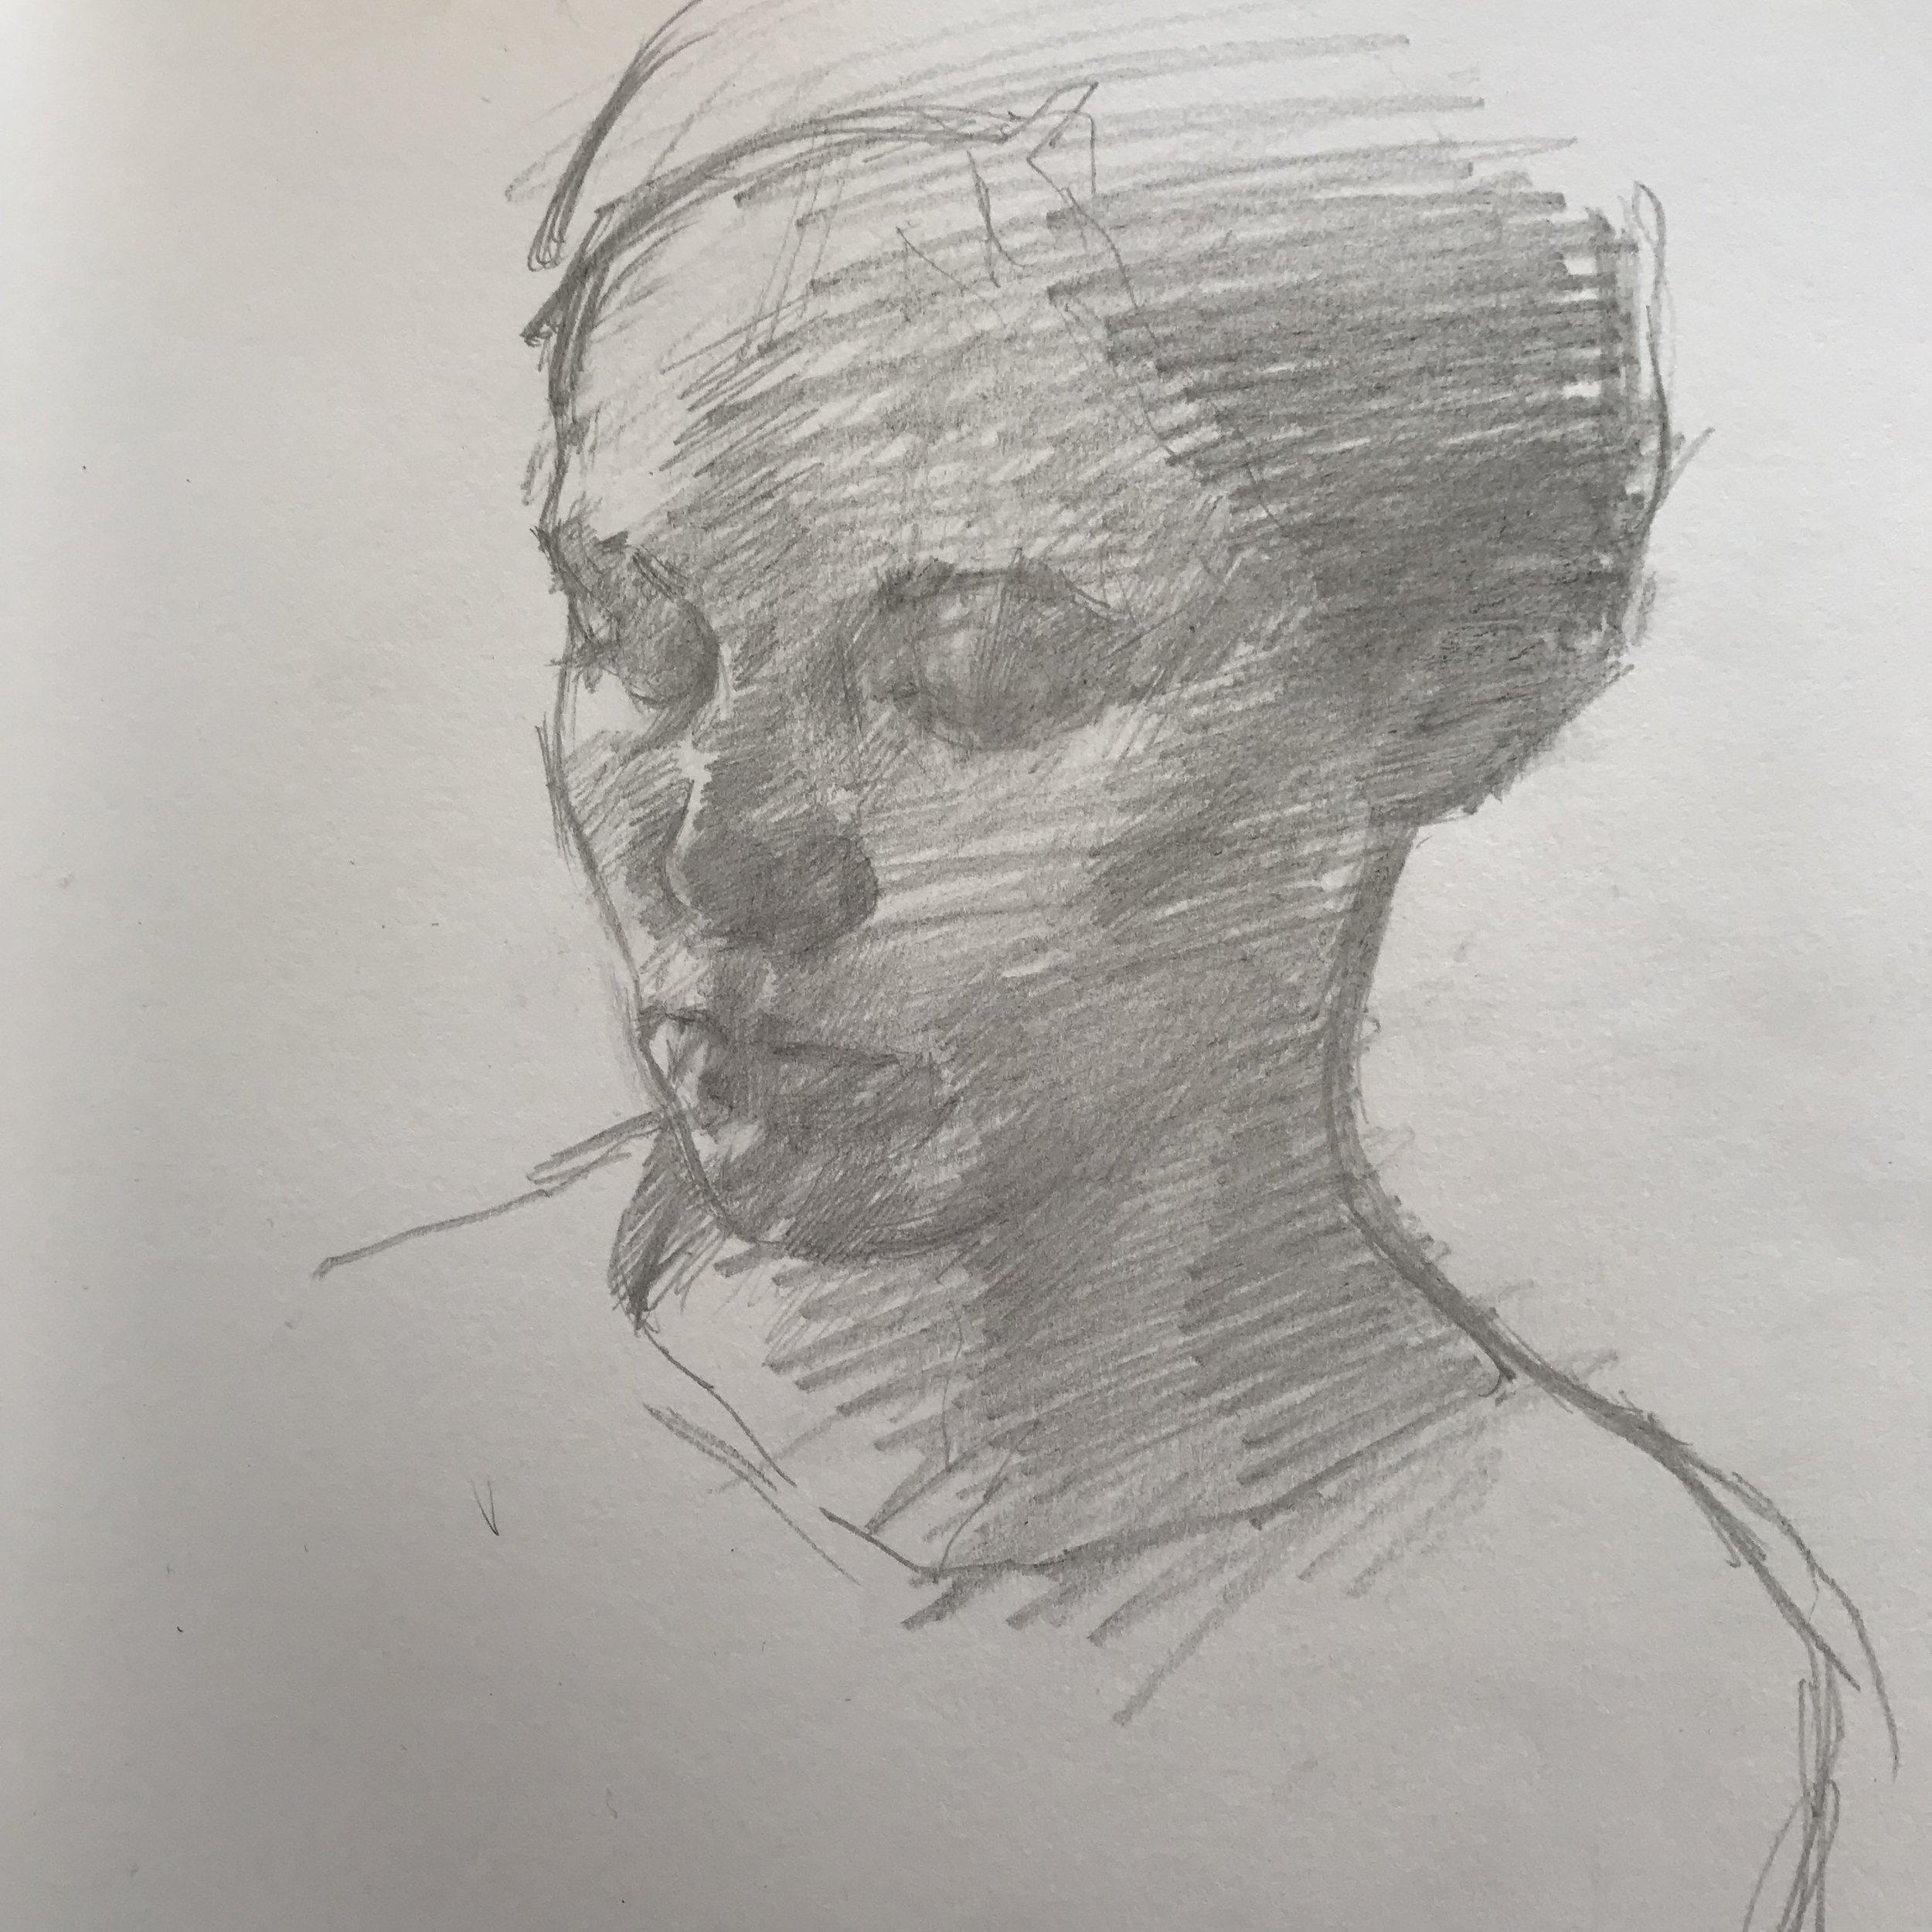 martin-brooks-amish-drawing-study.JPG